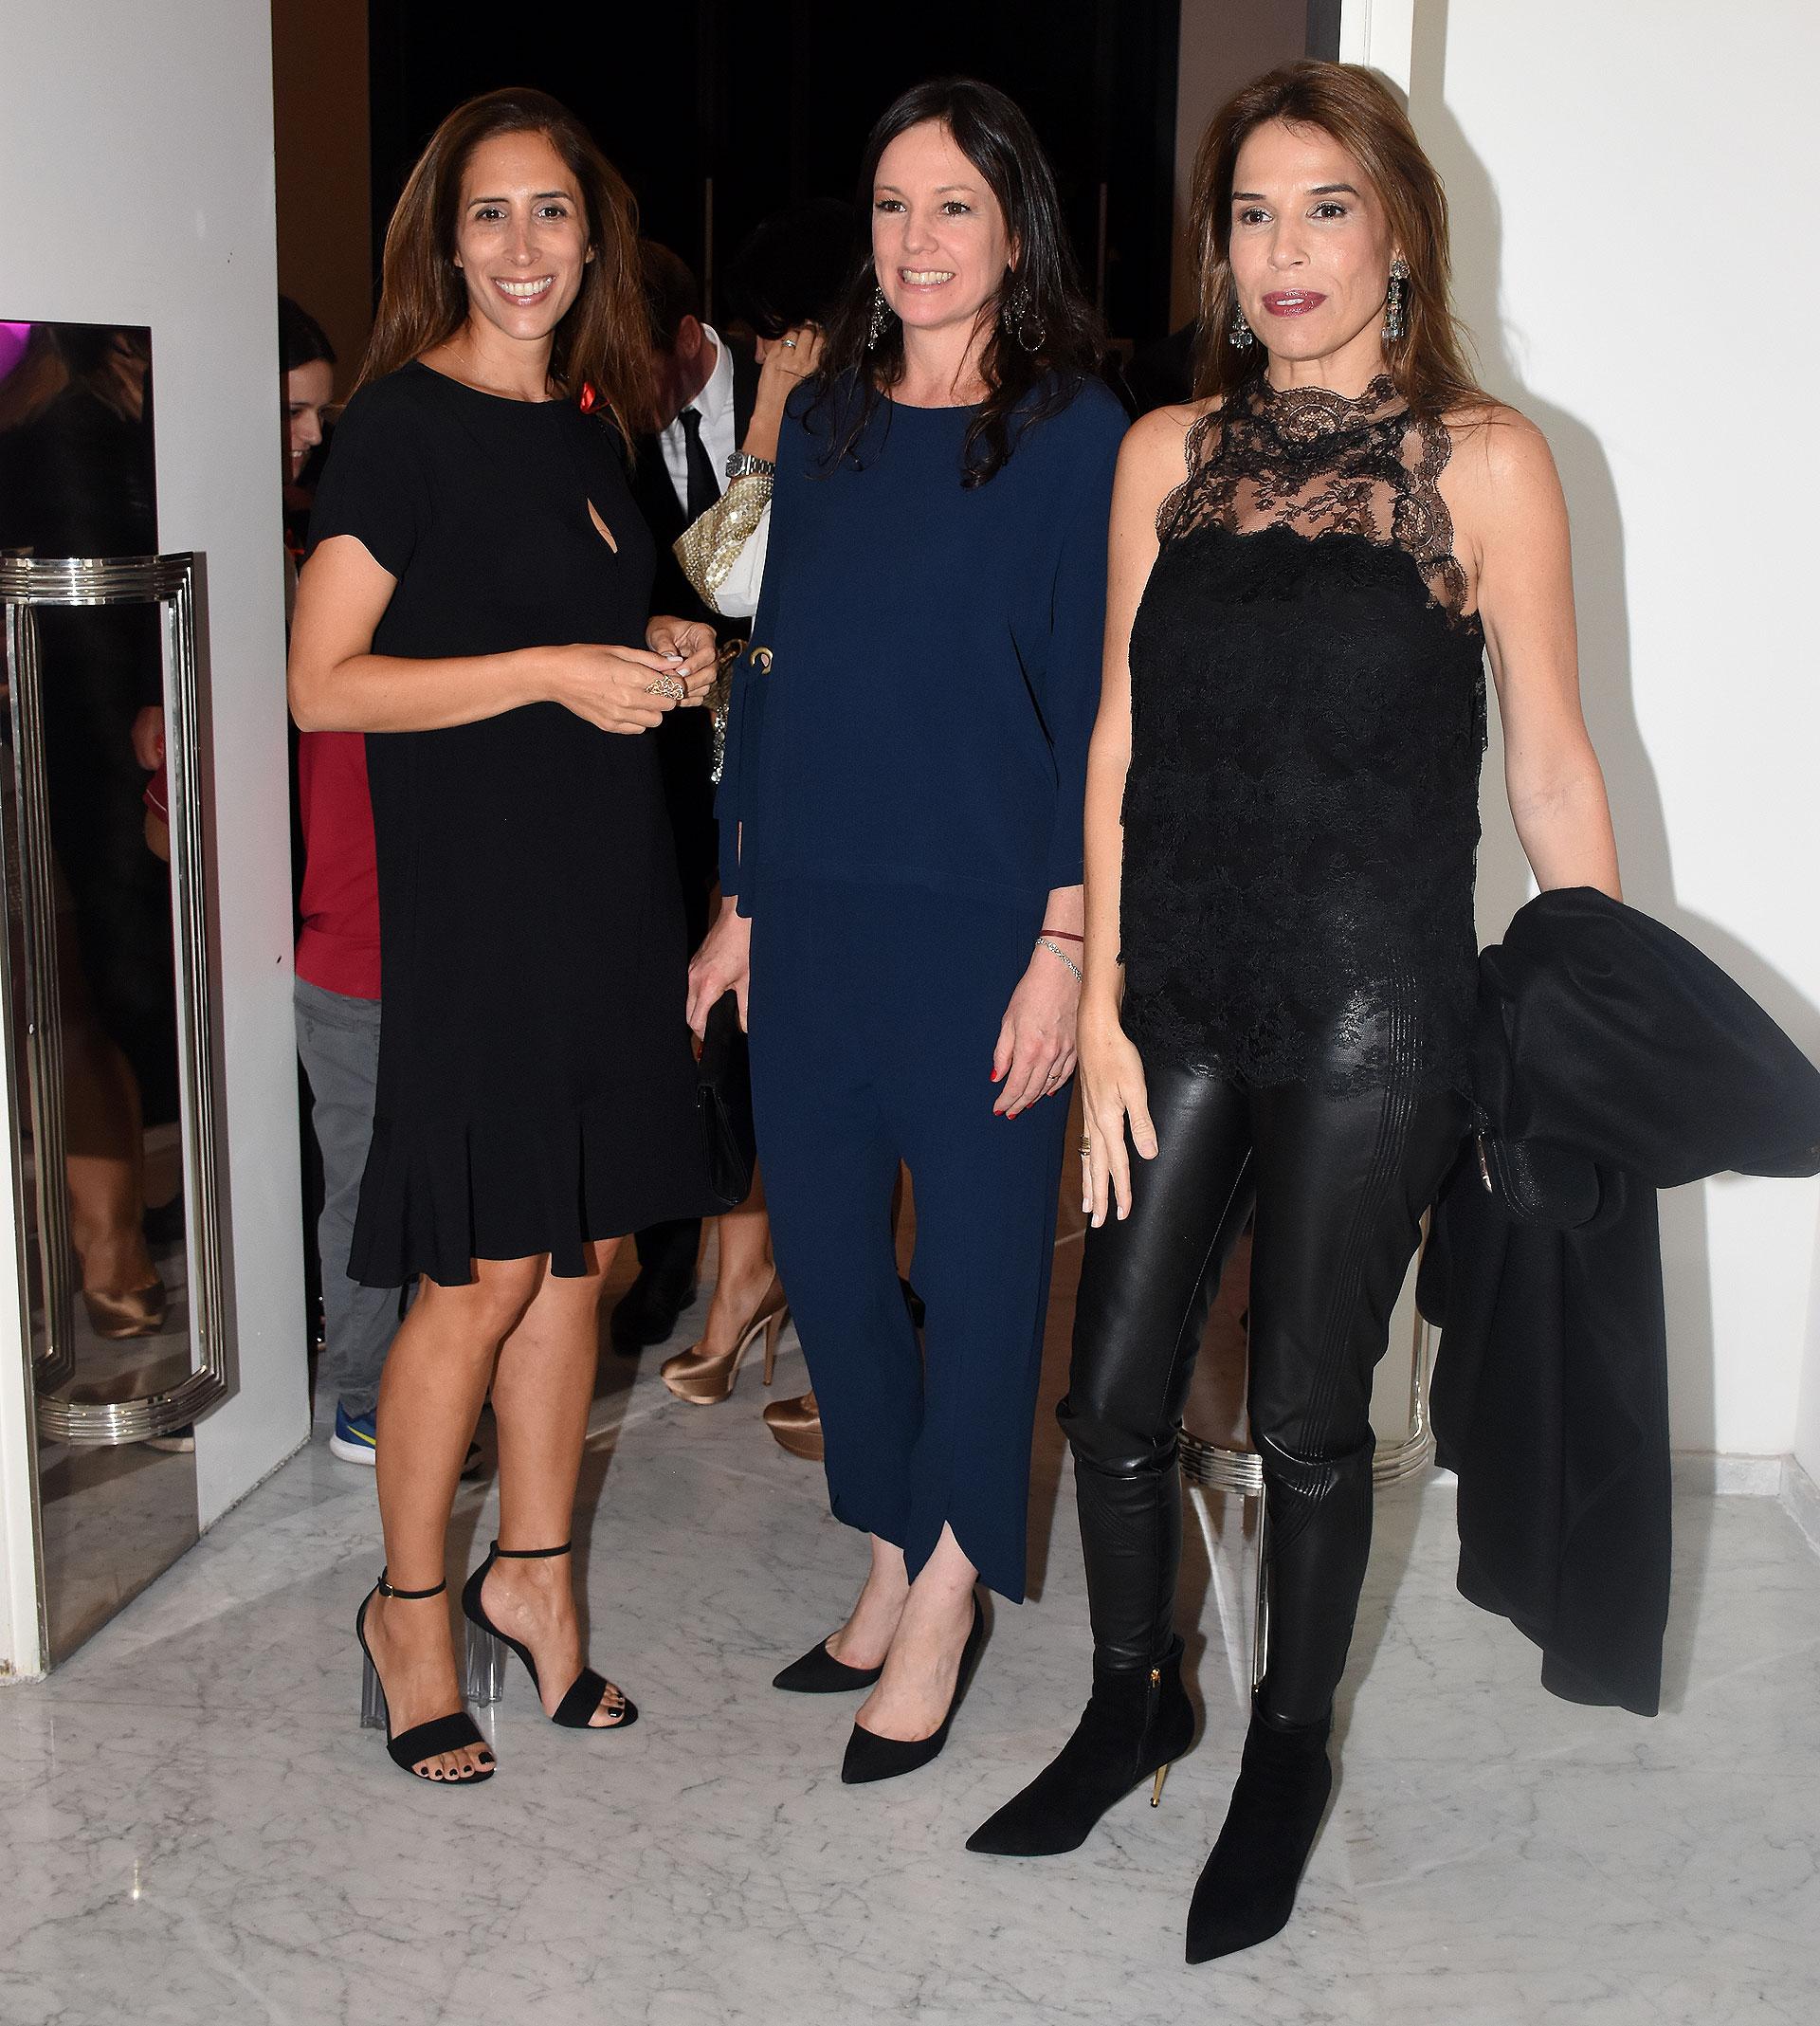 Florencia Perotti, Carolina Stanley y Agustina Caputo